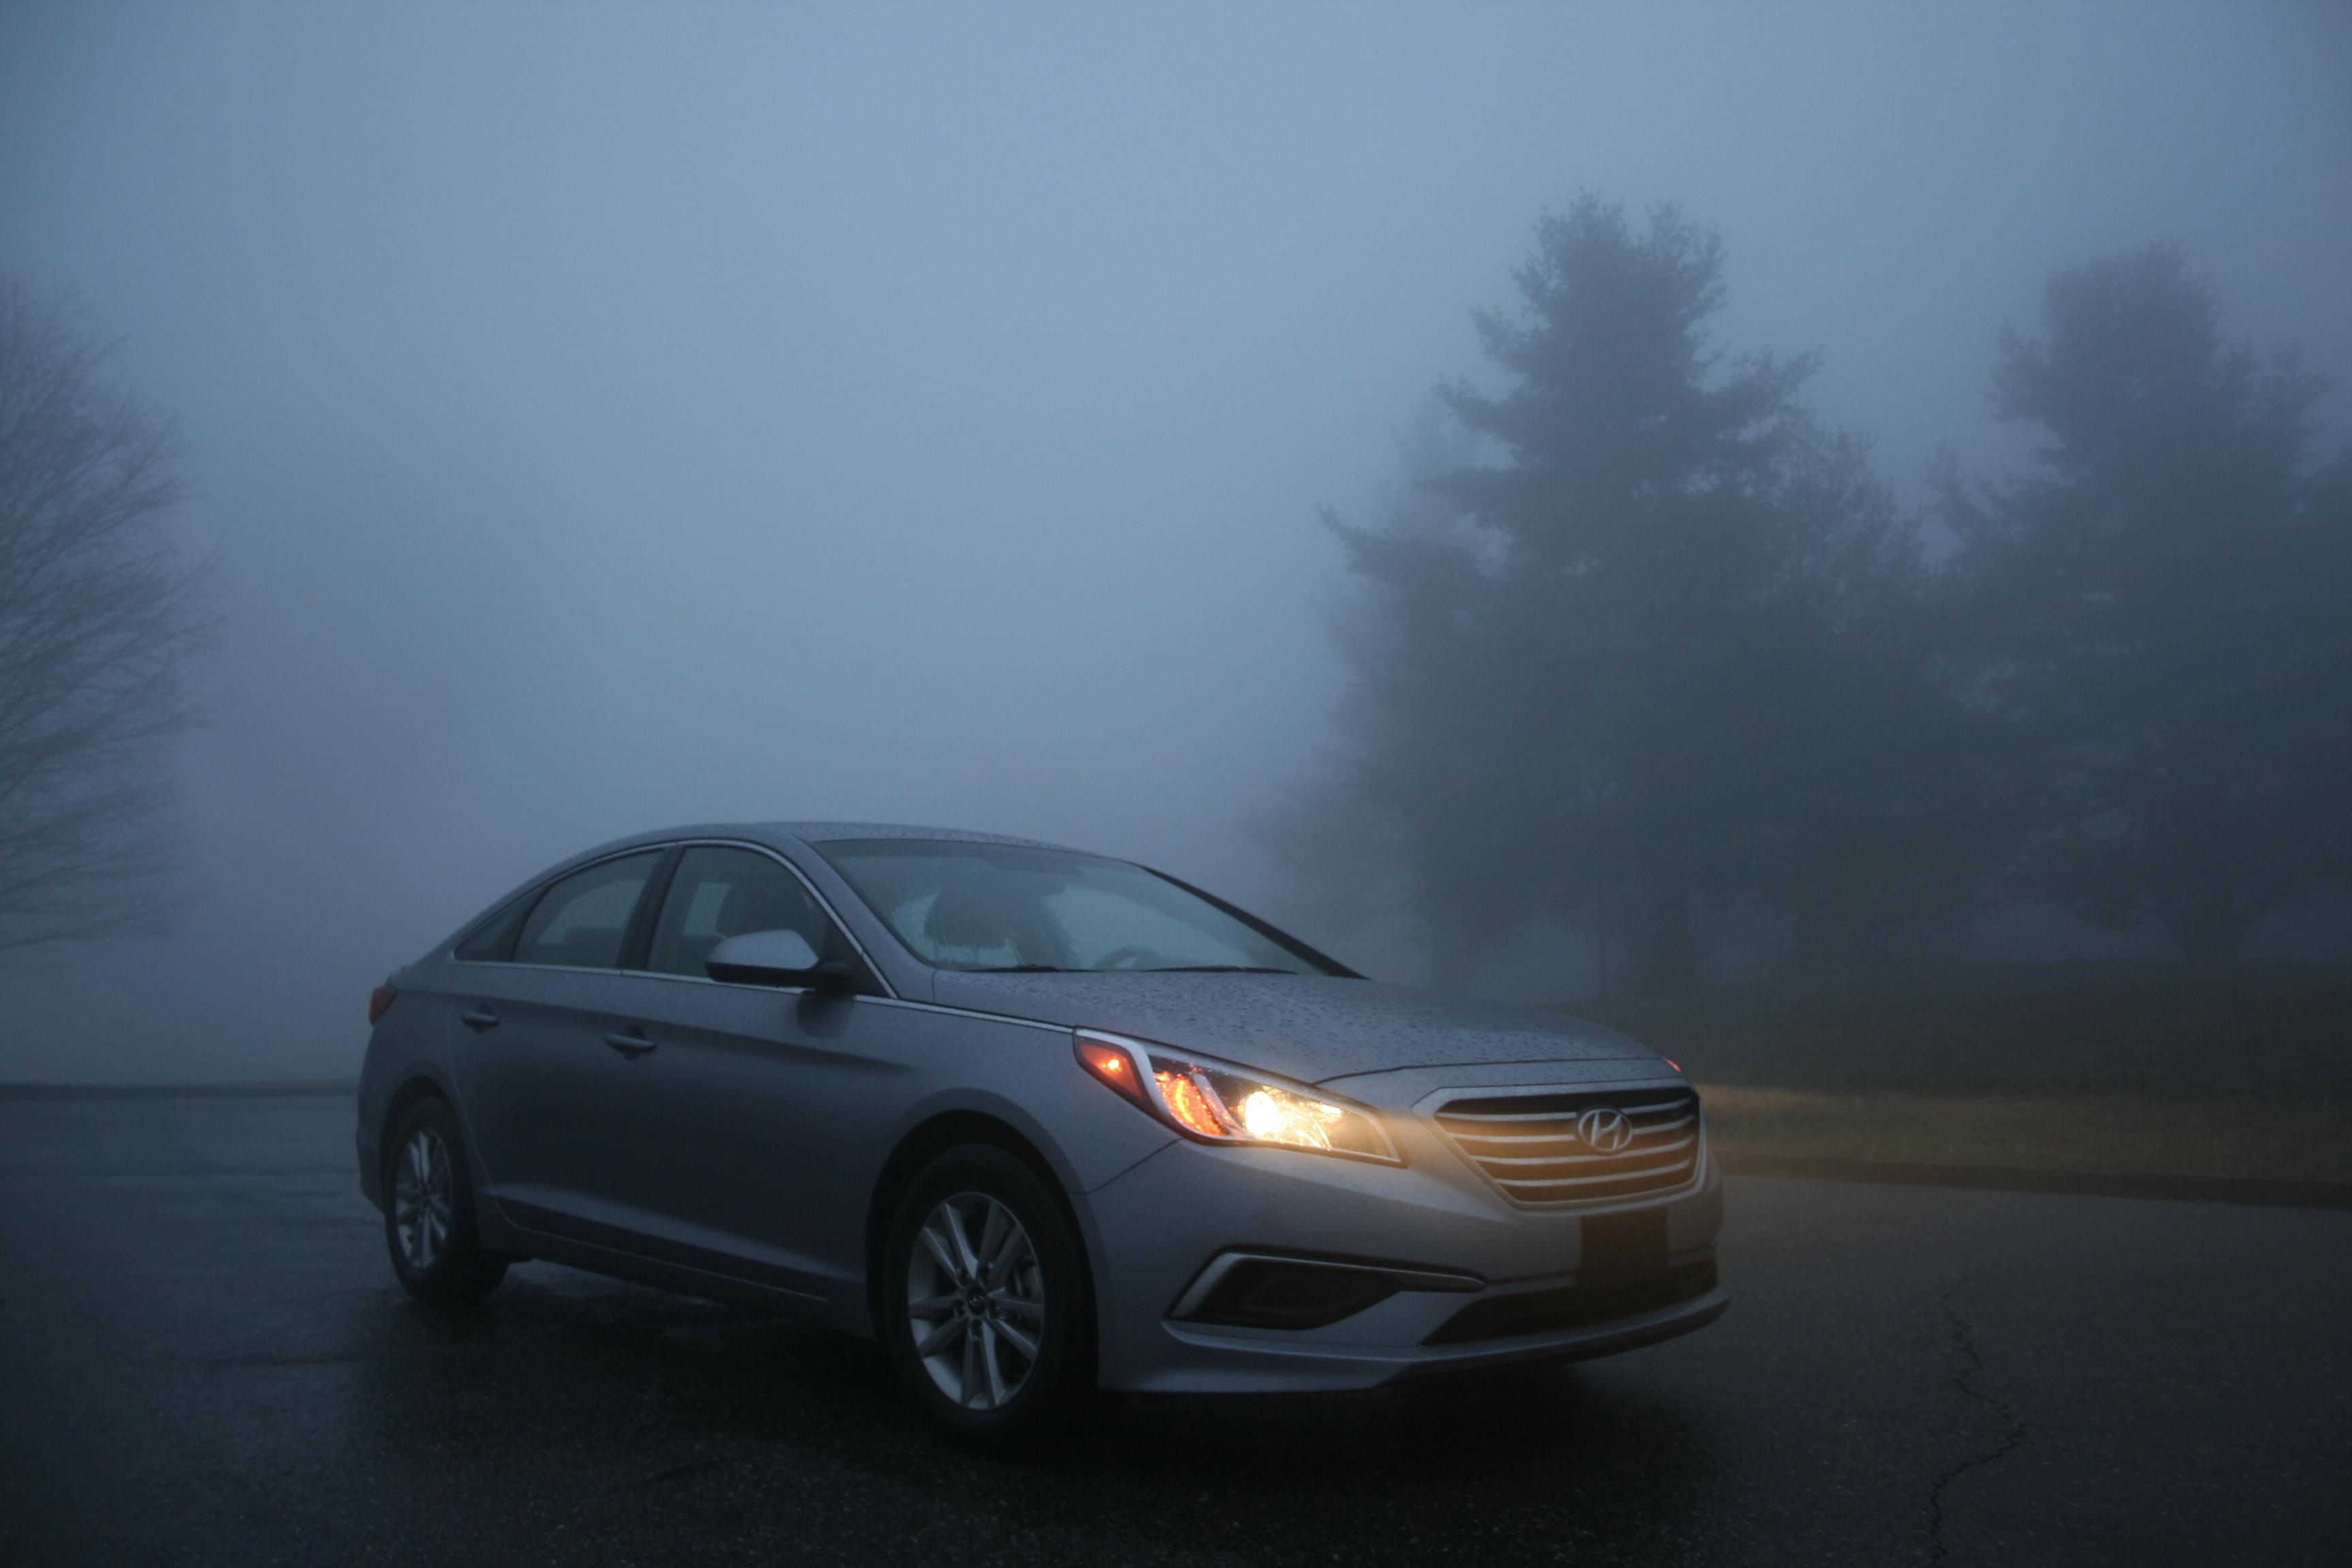 silver Hyundai sedan on gray concrete road